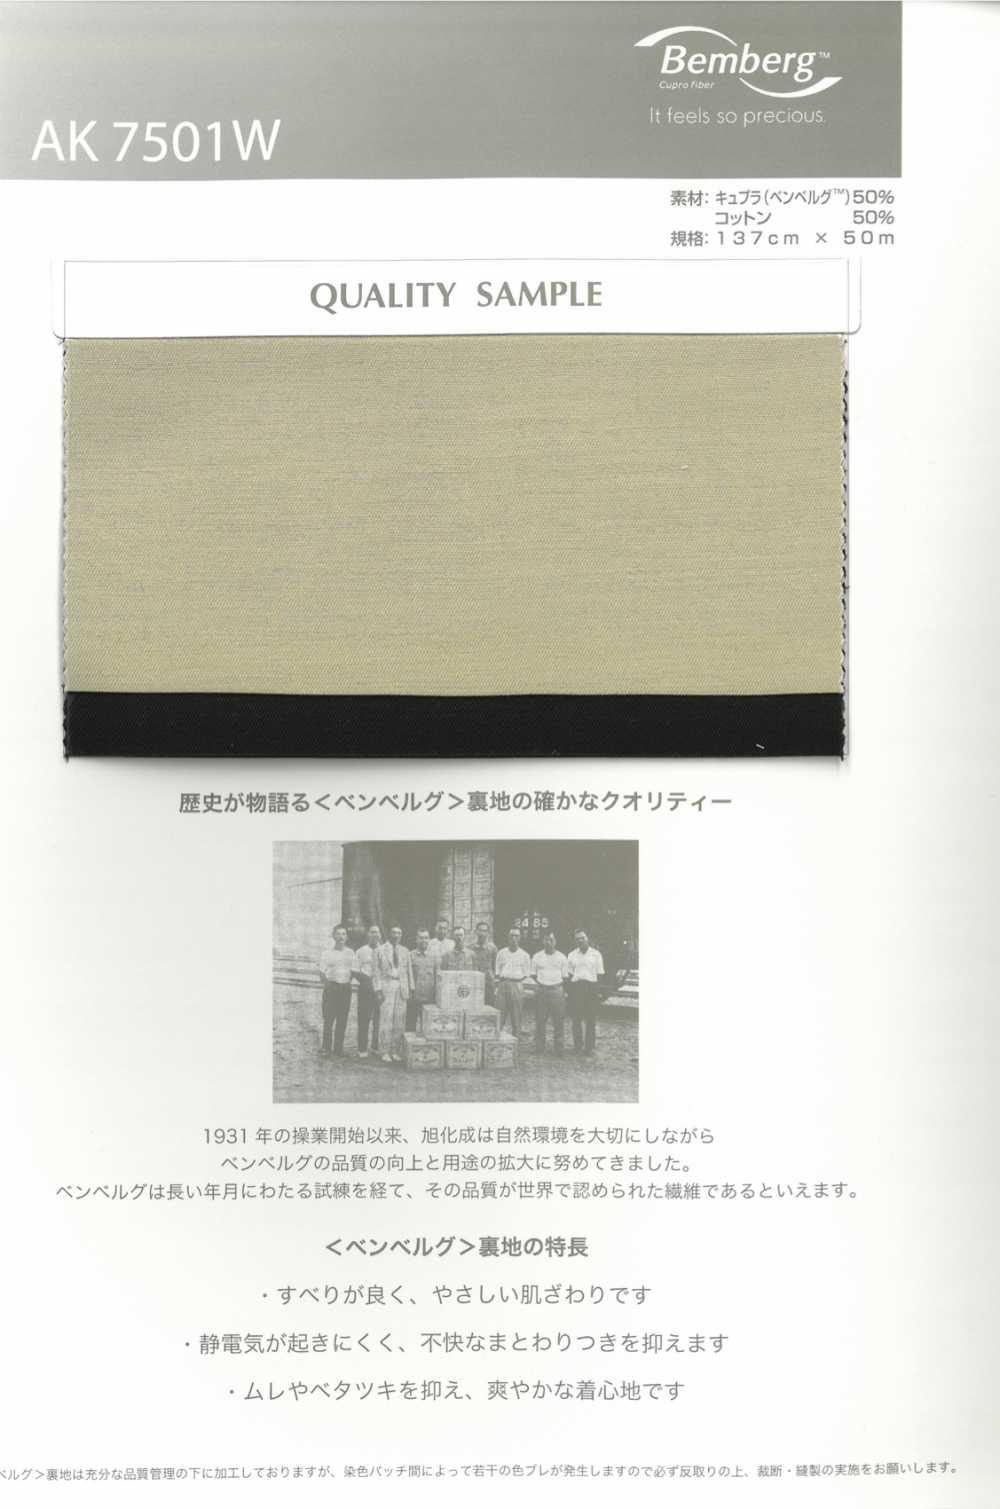 AK7501W キュプラコットン交織裏地 旭化成/オークラ商事 - ApparelX アパレル資材卸通販